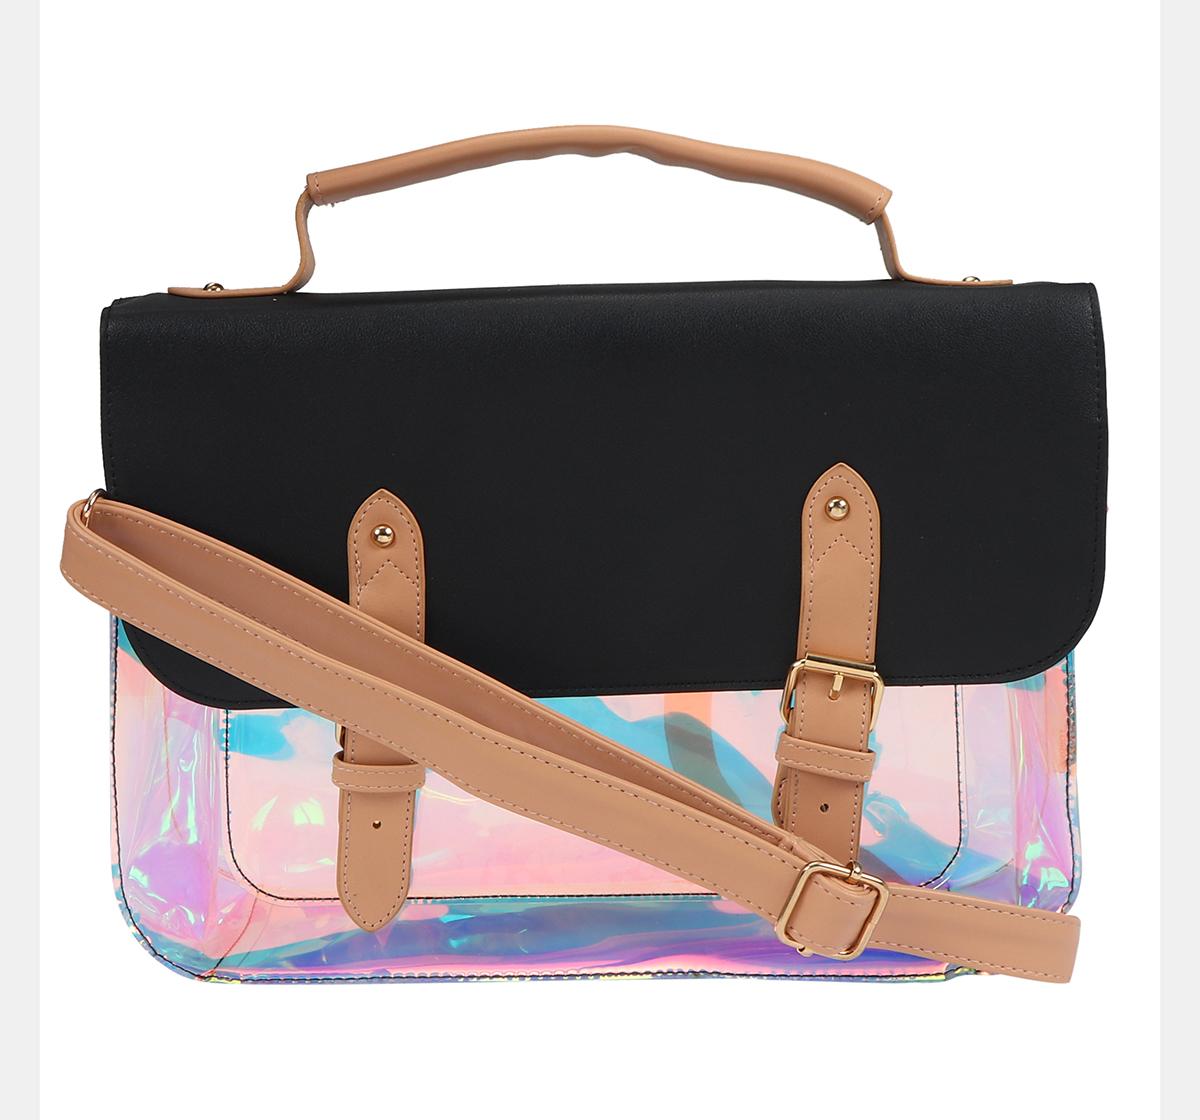 Hamster London | Hamster London Laptop Bag Black, 8Y+